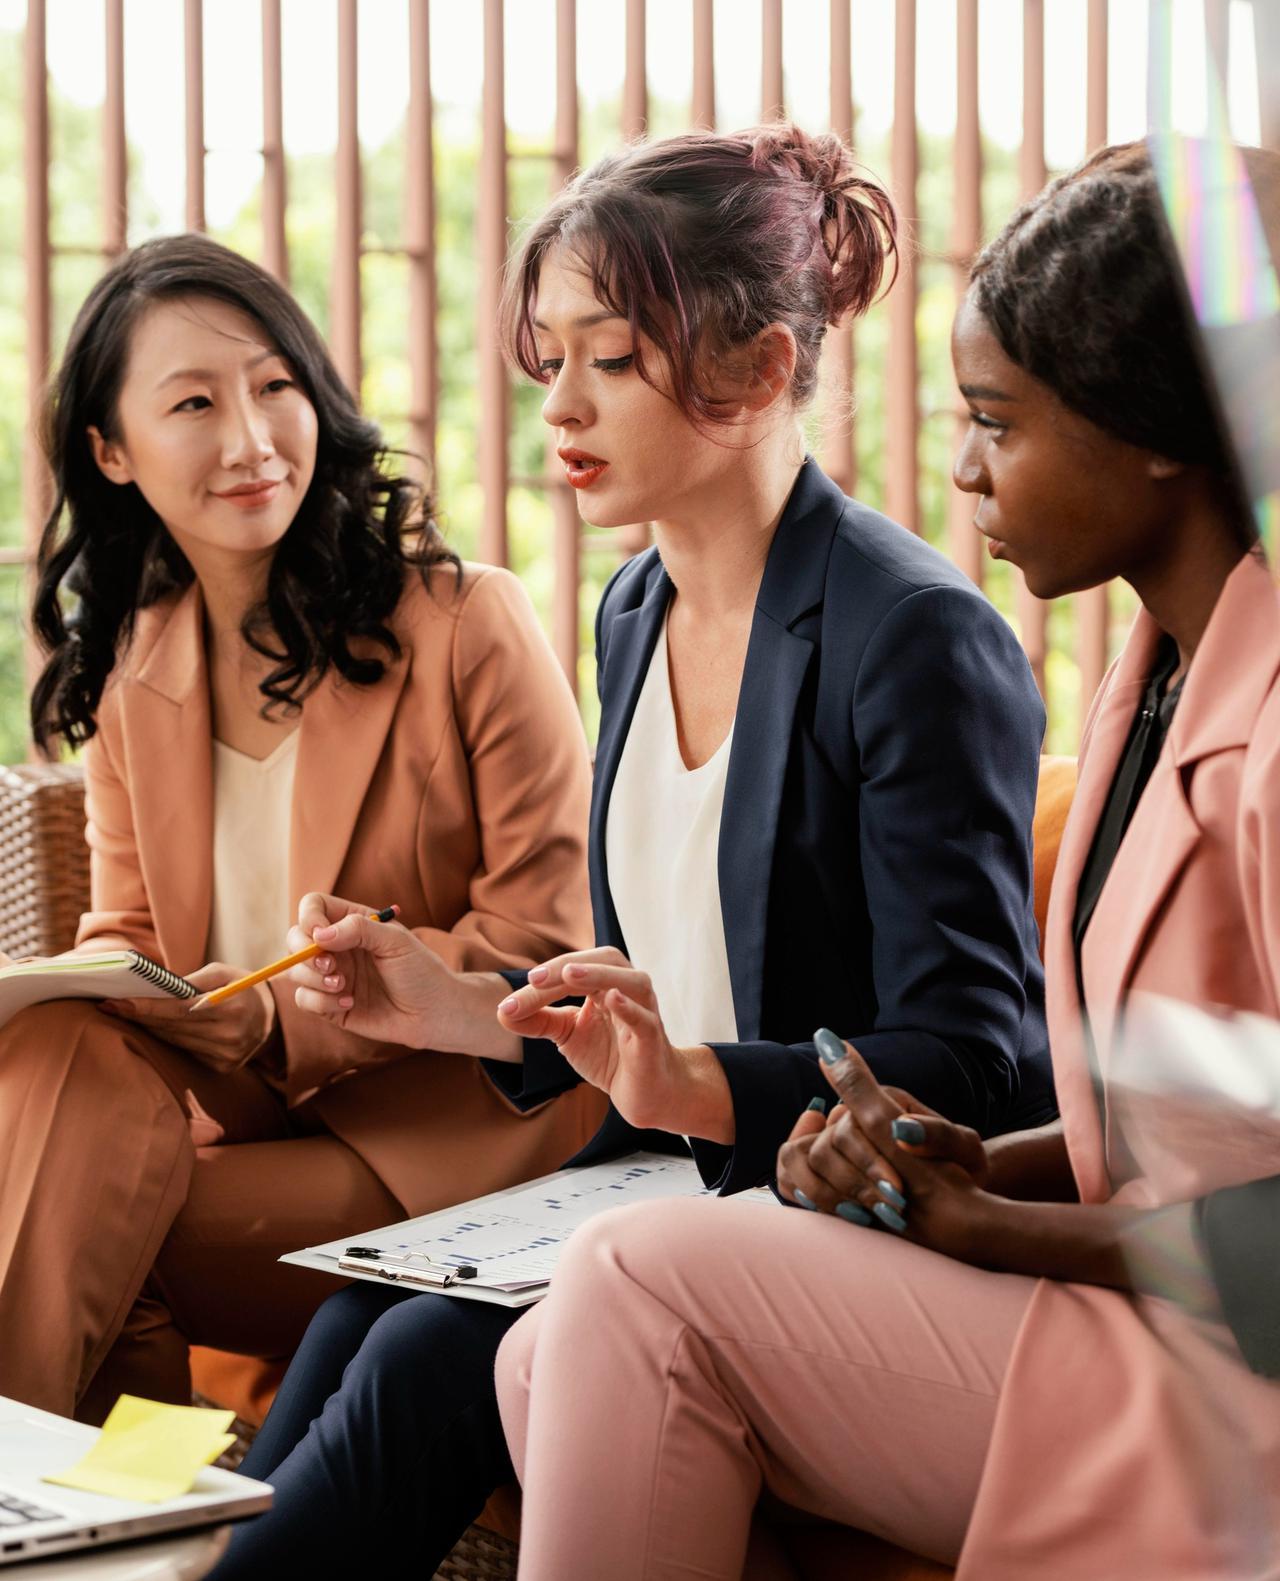 close-up-woman-leading-team-meeting.jpg